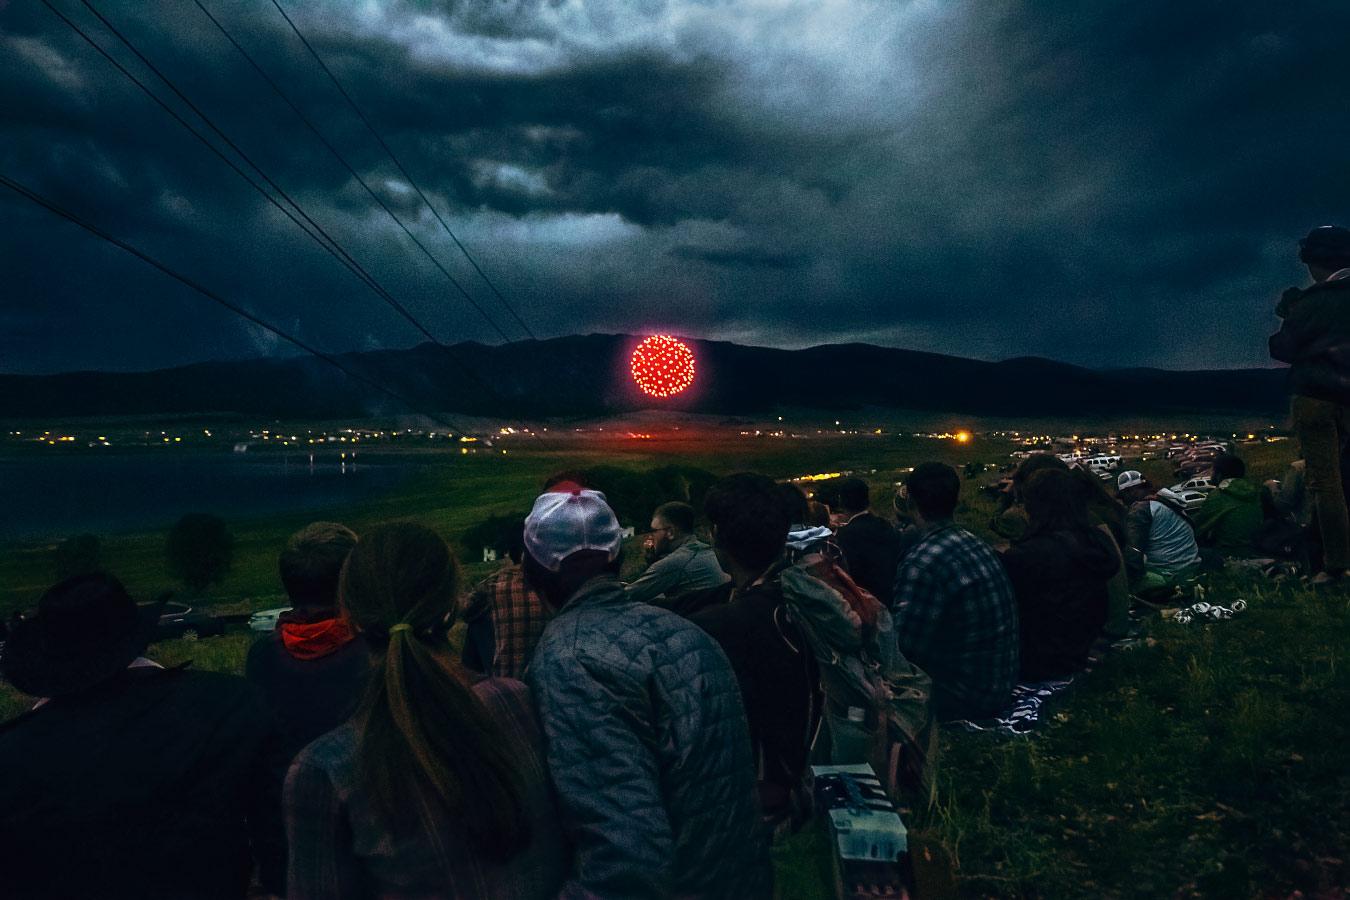 Fourth of July fireworks at the Eagles Nest reservoir